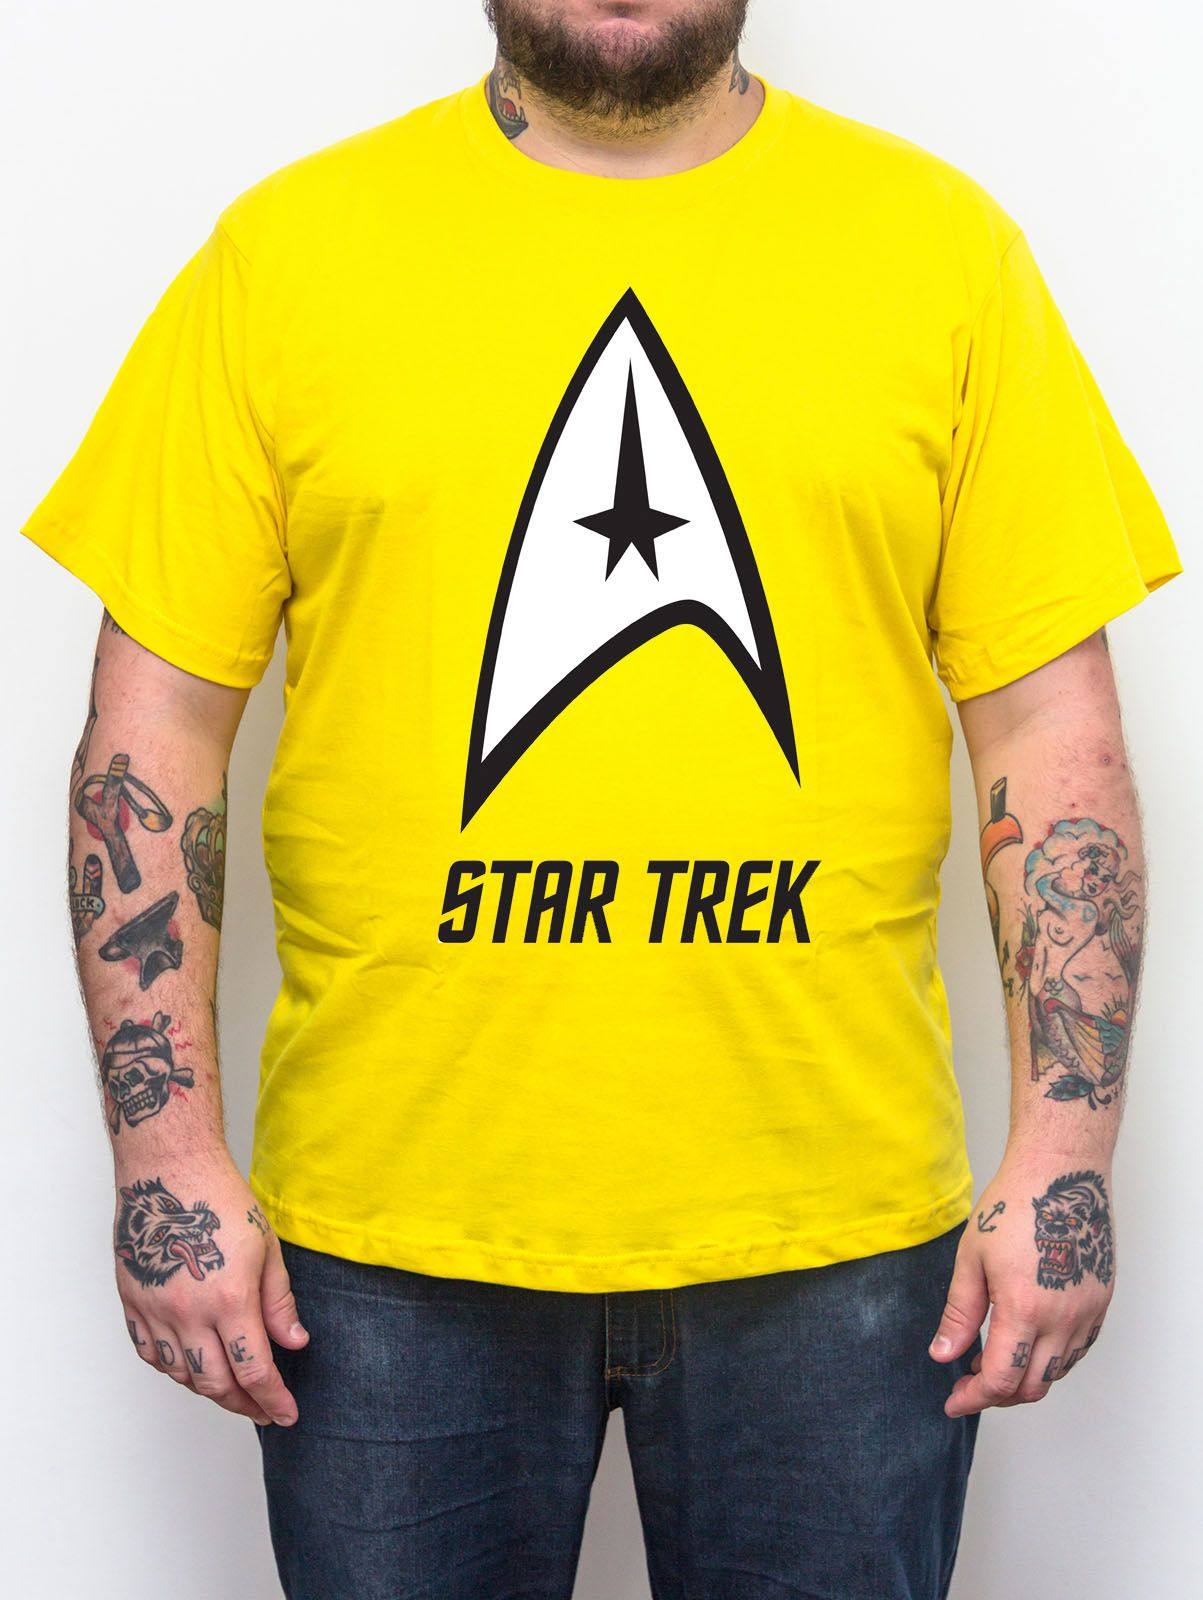 Camiseta Star Trek Amarela - Plus Size - Tamanho XG  - HShop